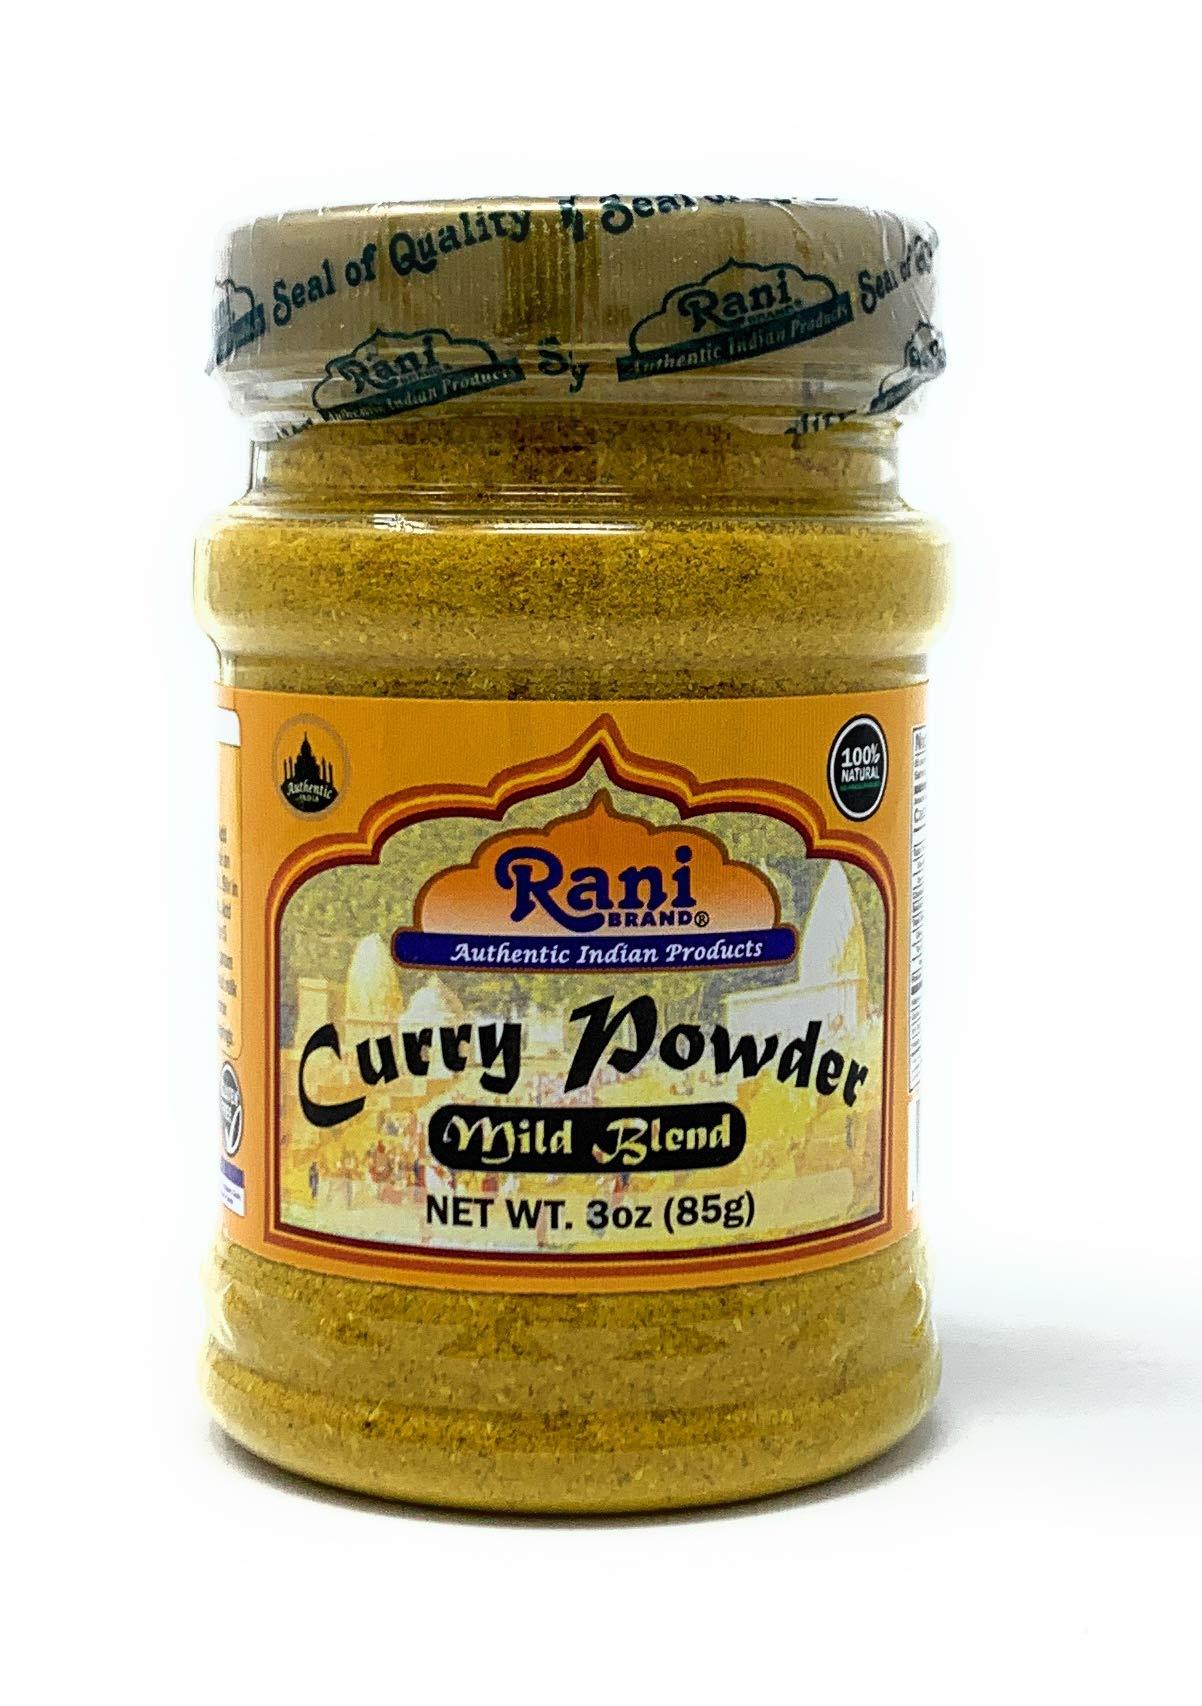 Rani Curry Powder Mild Natural 10-Spice Blend 85g (3oz) ~ Salt Free | Vegan | Gluten Free Ingredients | NON-GMO